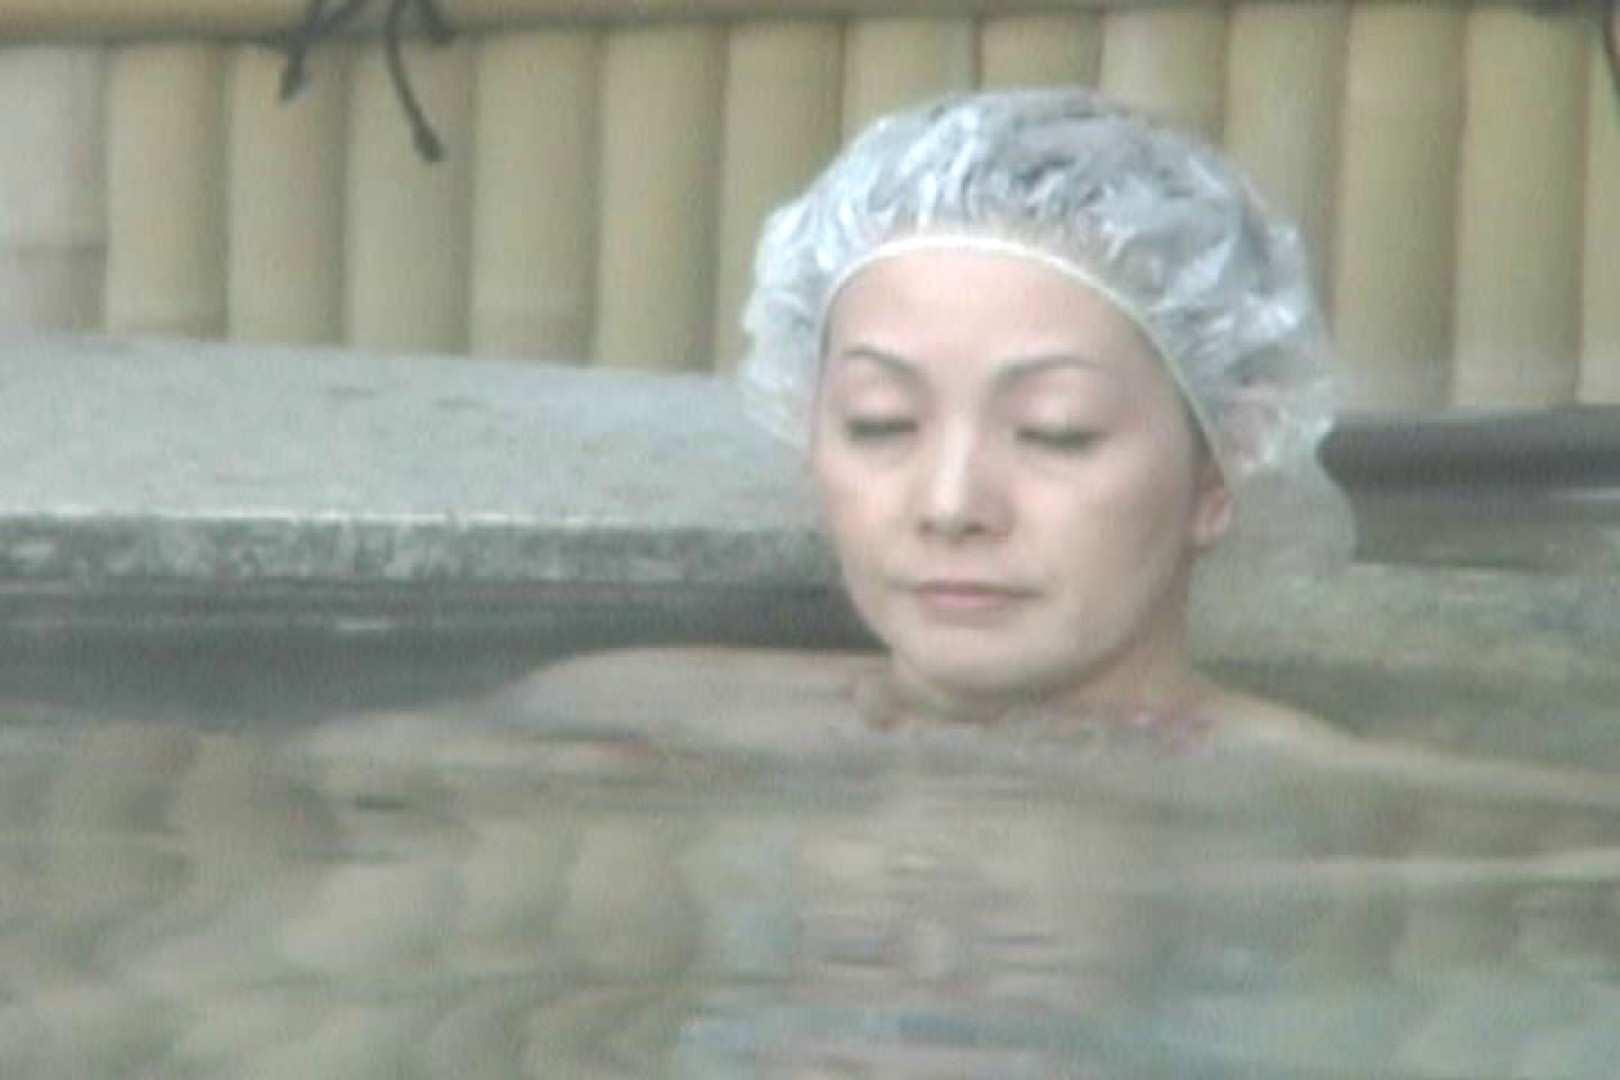 Aquaな露天風呂Vol.592 盗撮師作品  91pic 84